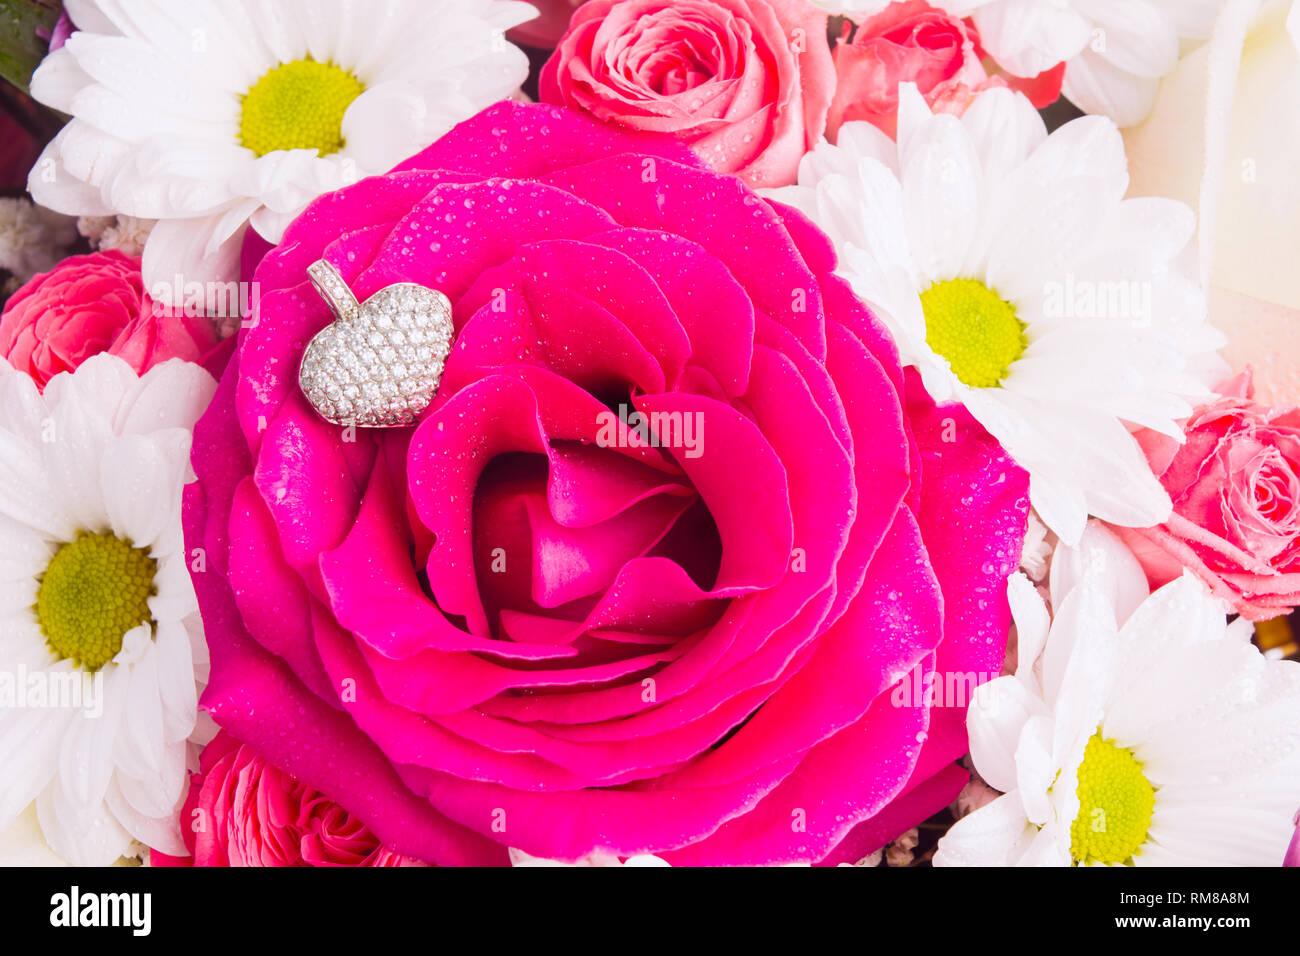 Pendentif En Or Blanc En Forme De Coeur Avec Plus De Rose